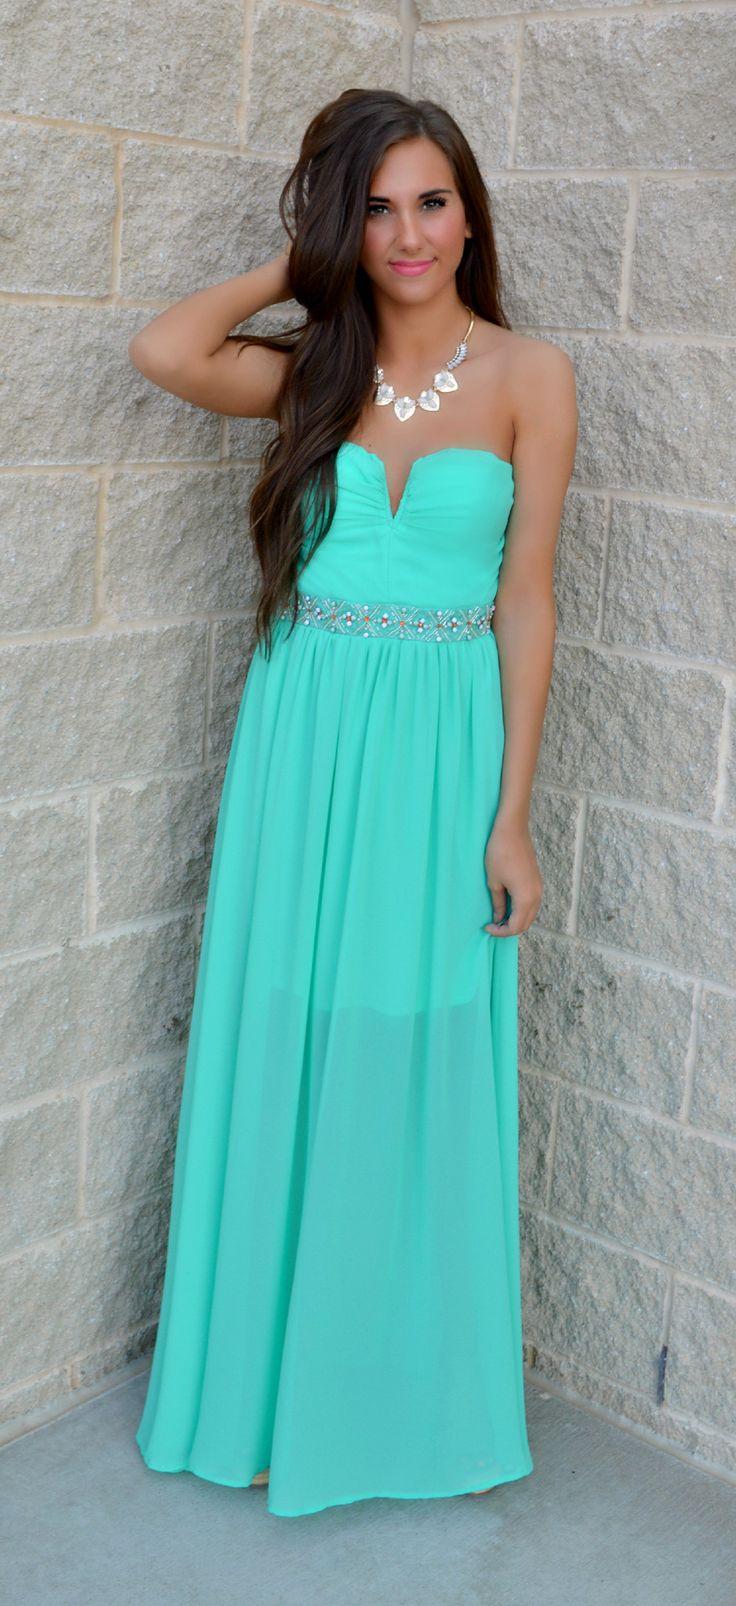 Daisy Fuentes Maxi Dresses for Wedding